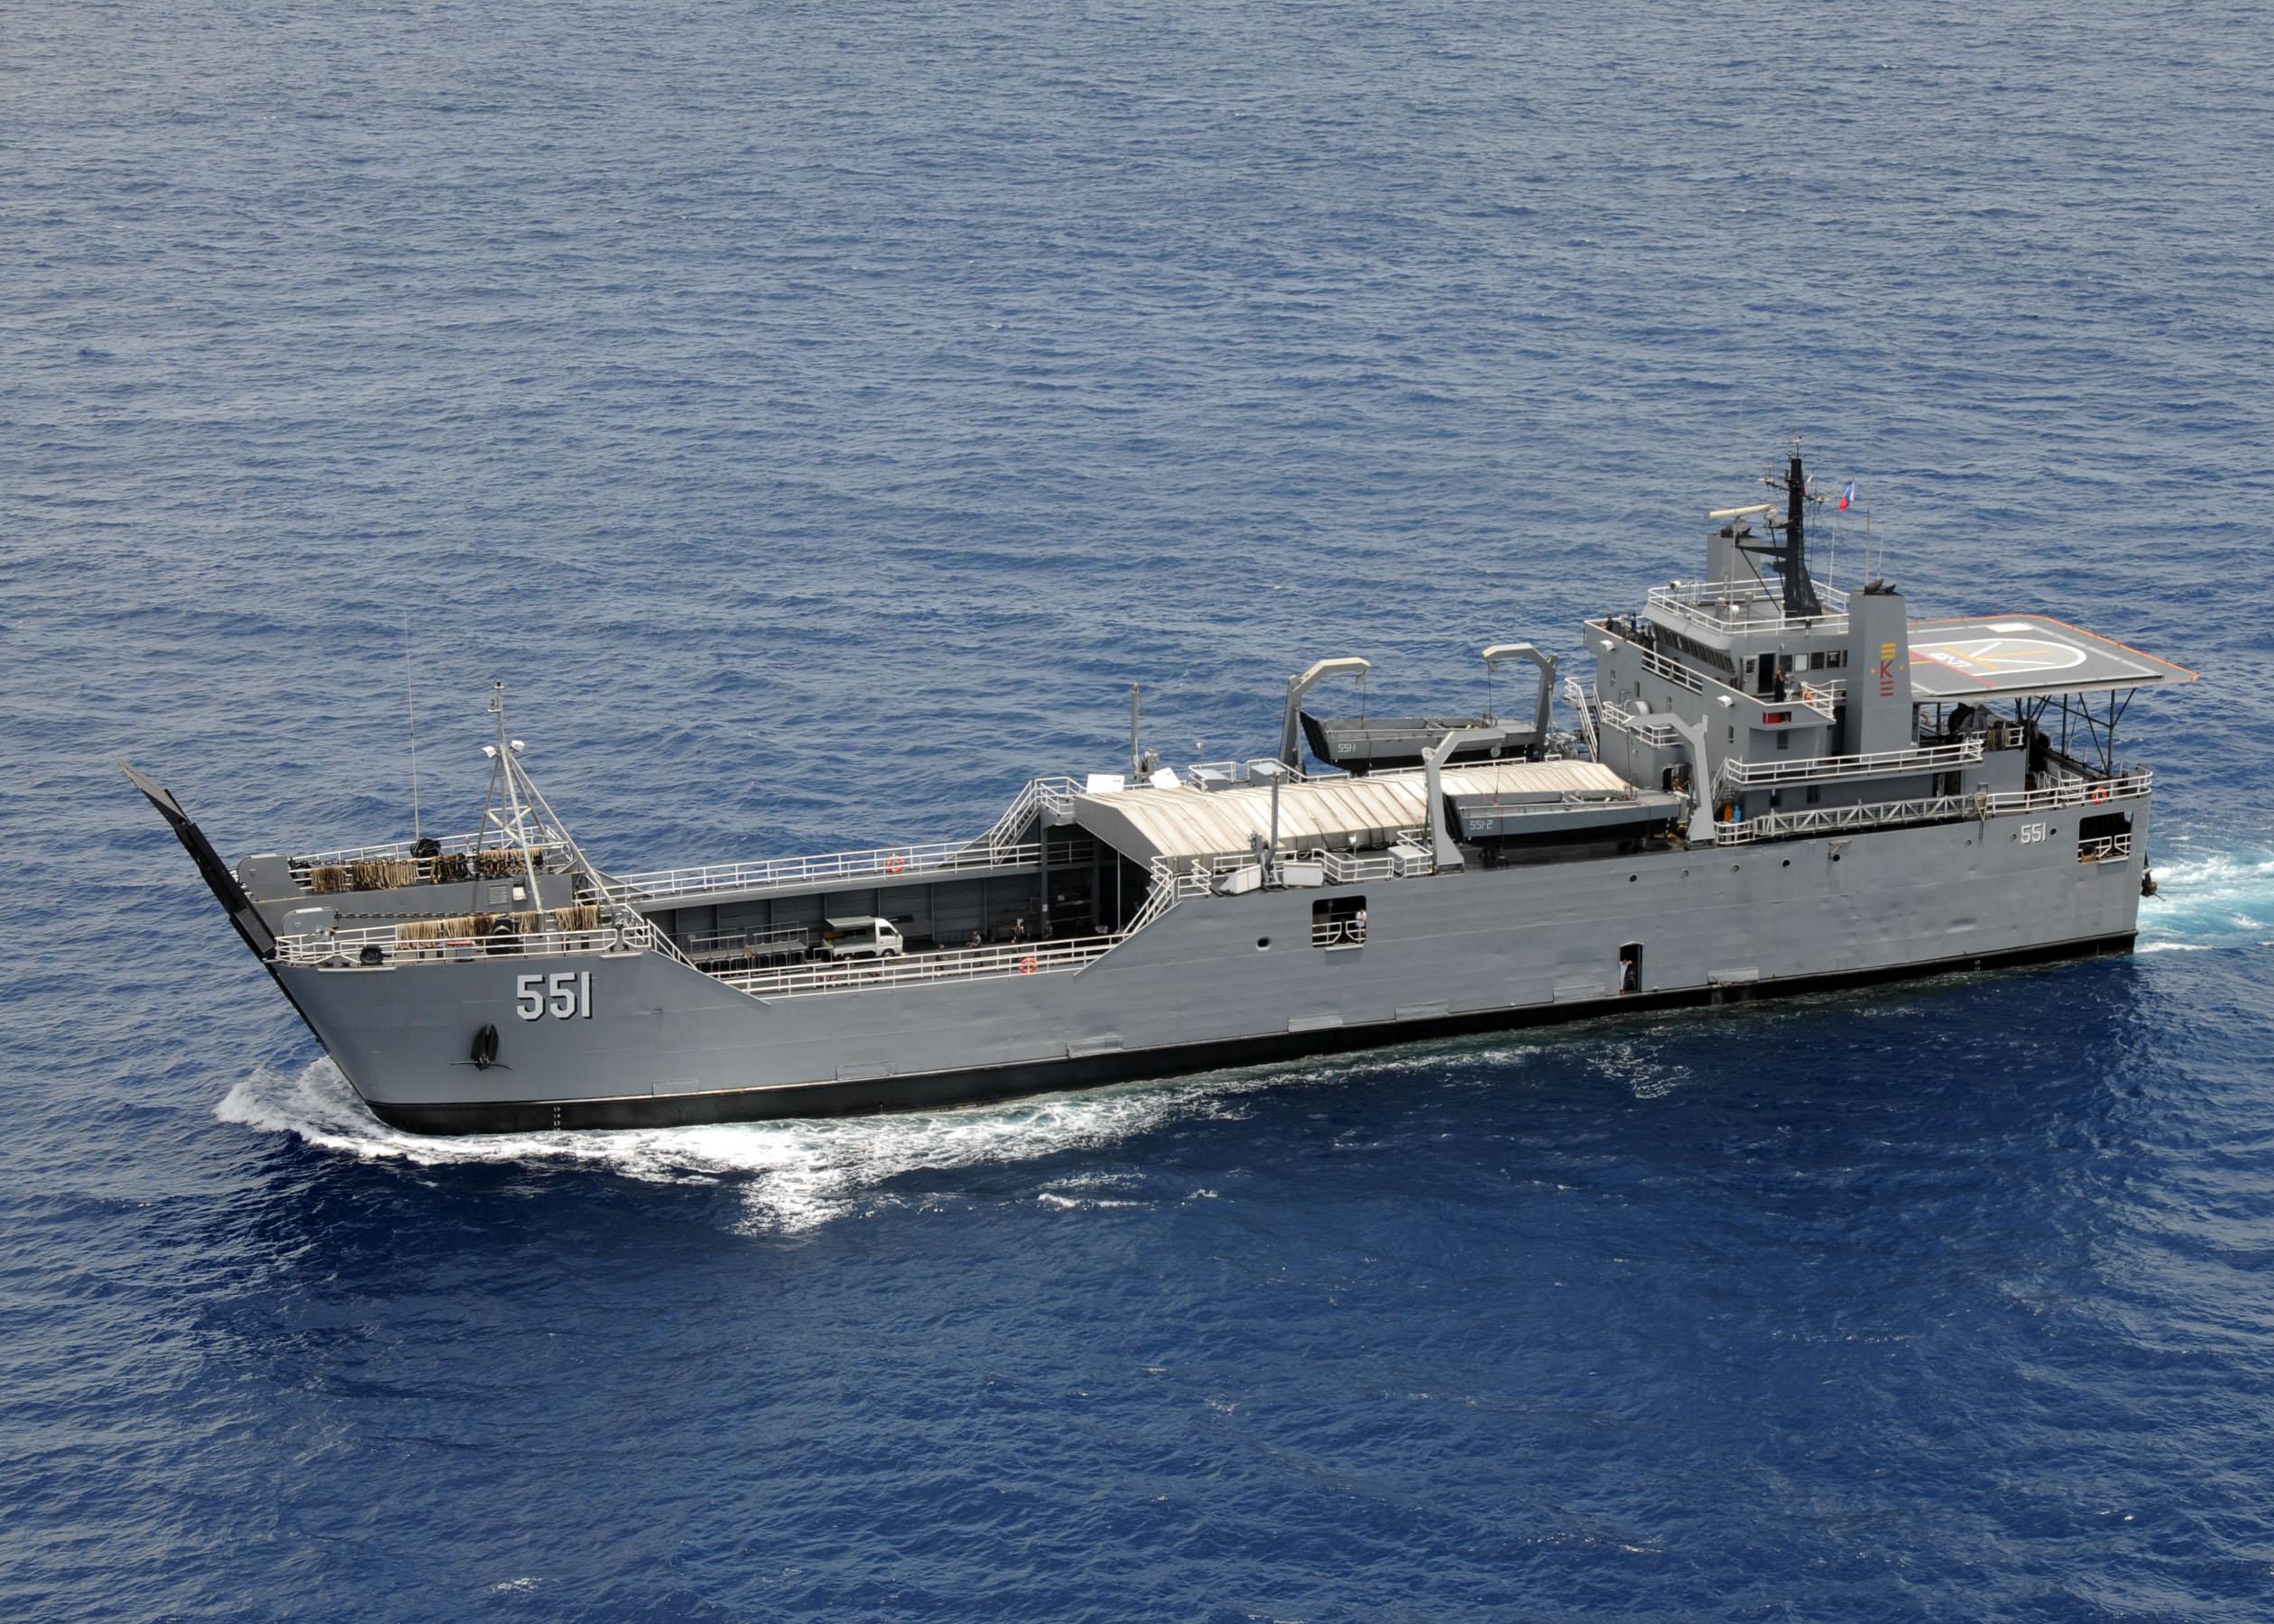 Dagupan Philippines  City pictures : Forces of the Philippines Navy logistics support vessel BRP Dagupan ...